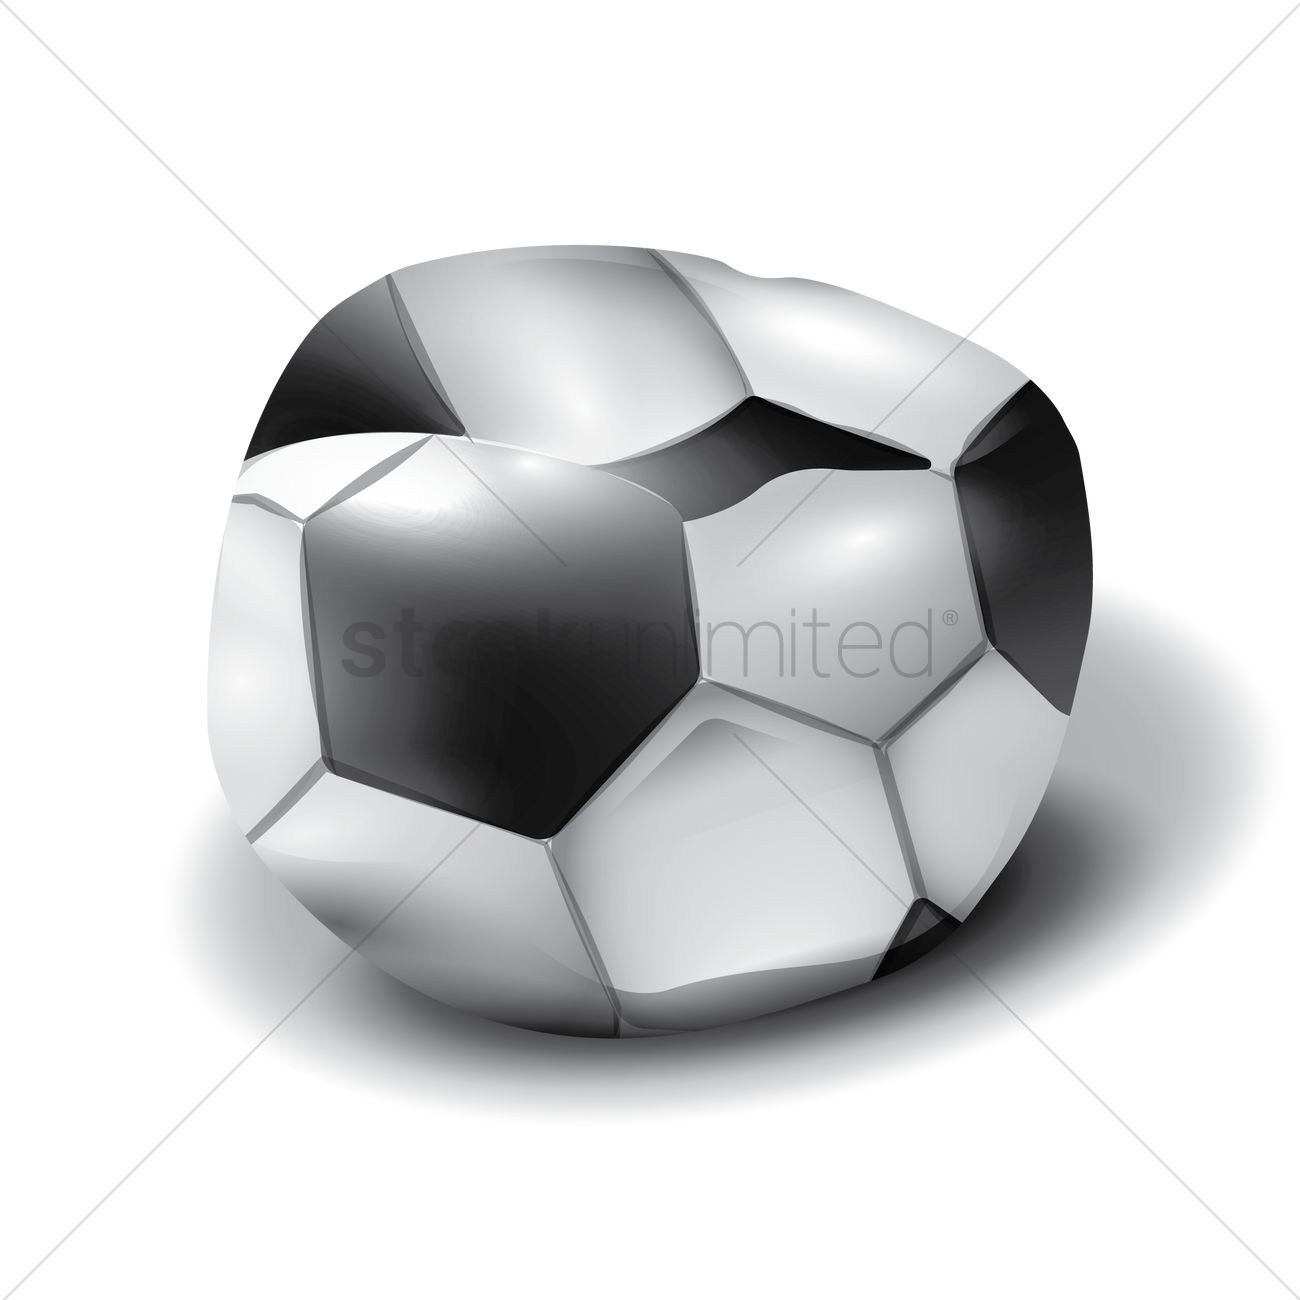 1300x1300 Deflated Soccer Ball Vector Image